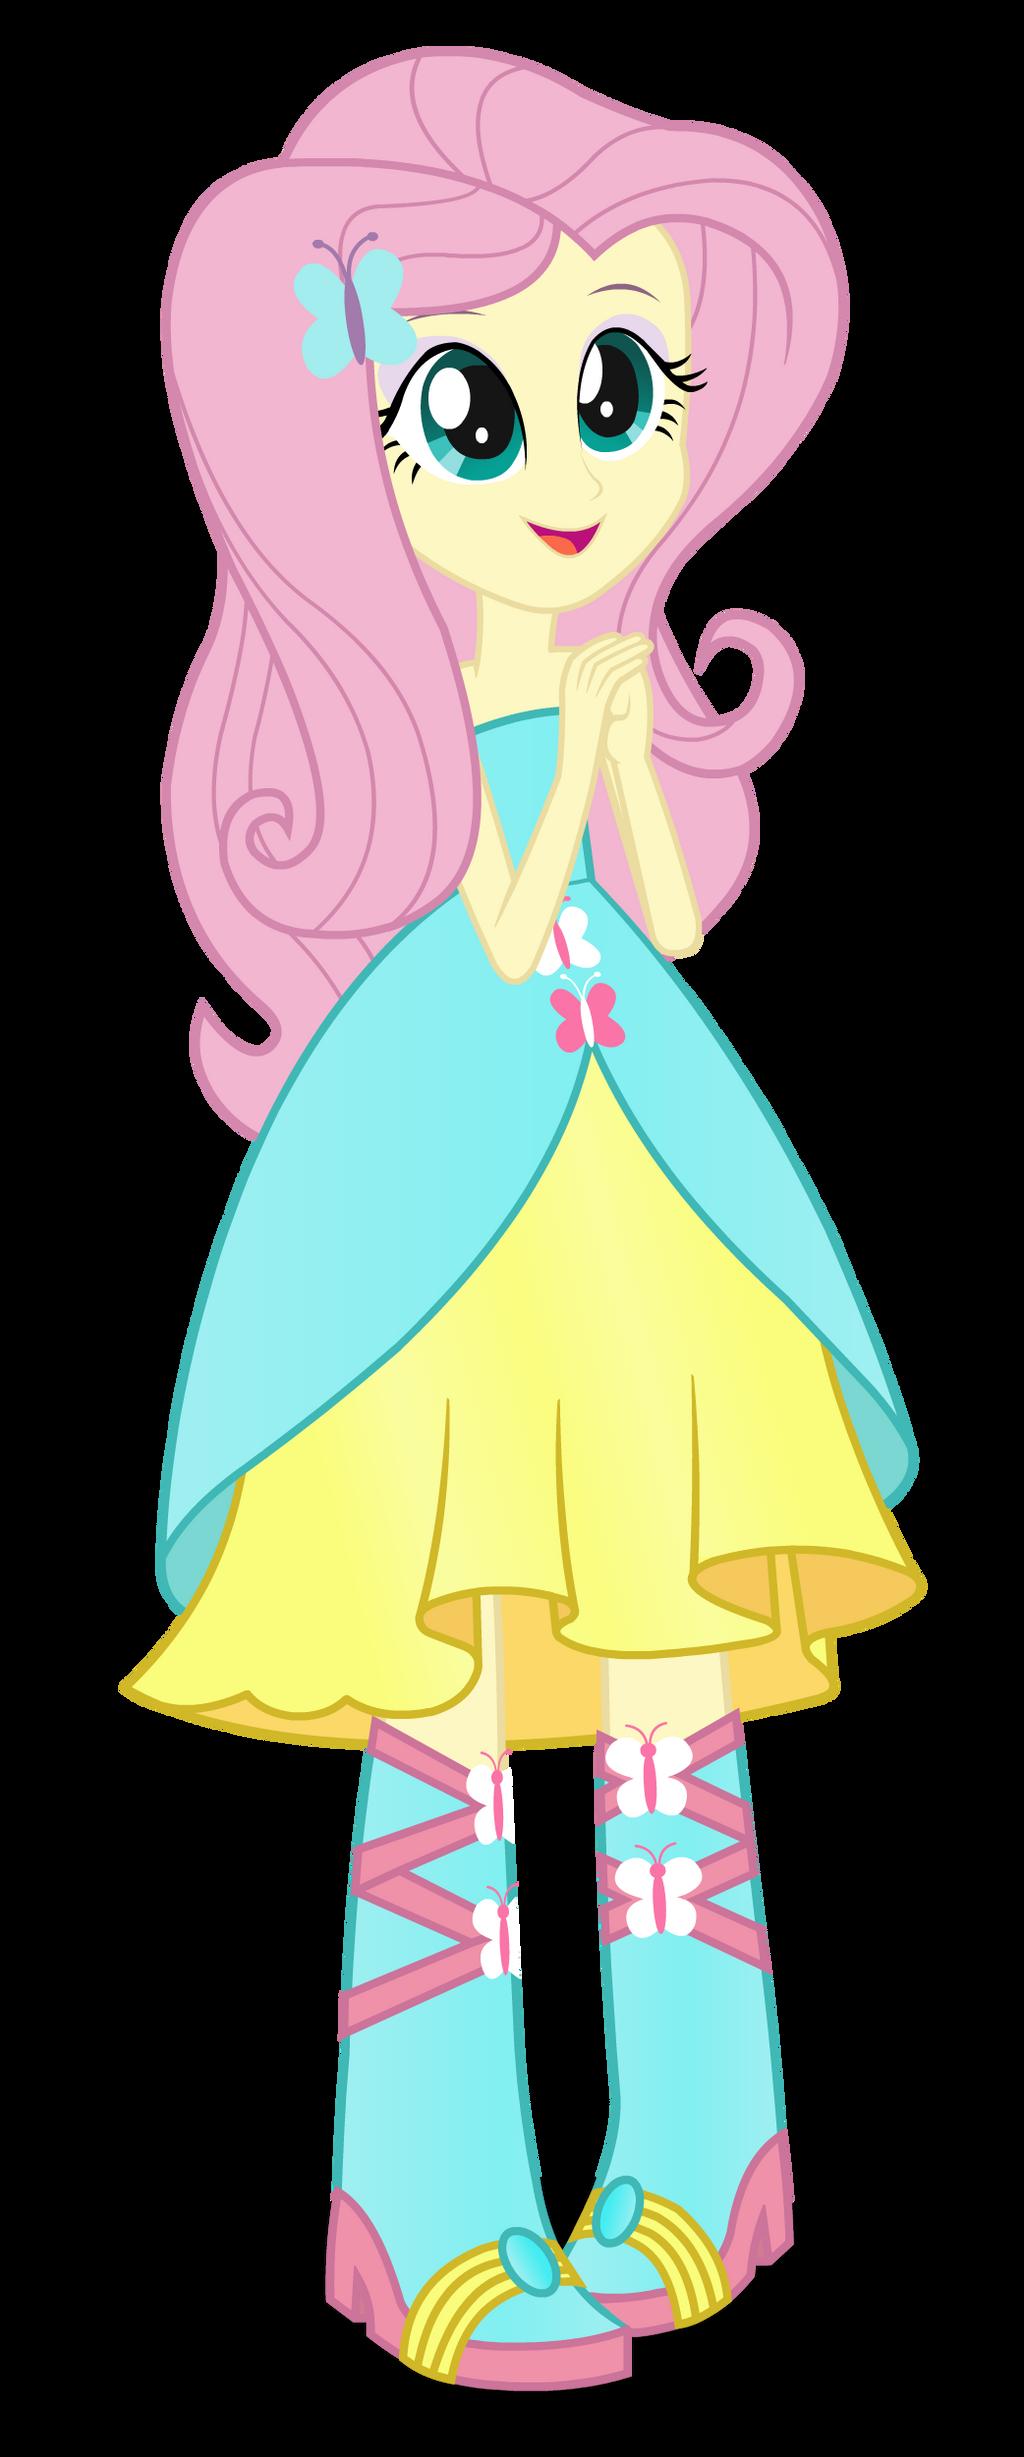 Fluttershy - ver. 2 - Equestria Girl by negasun